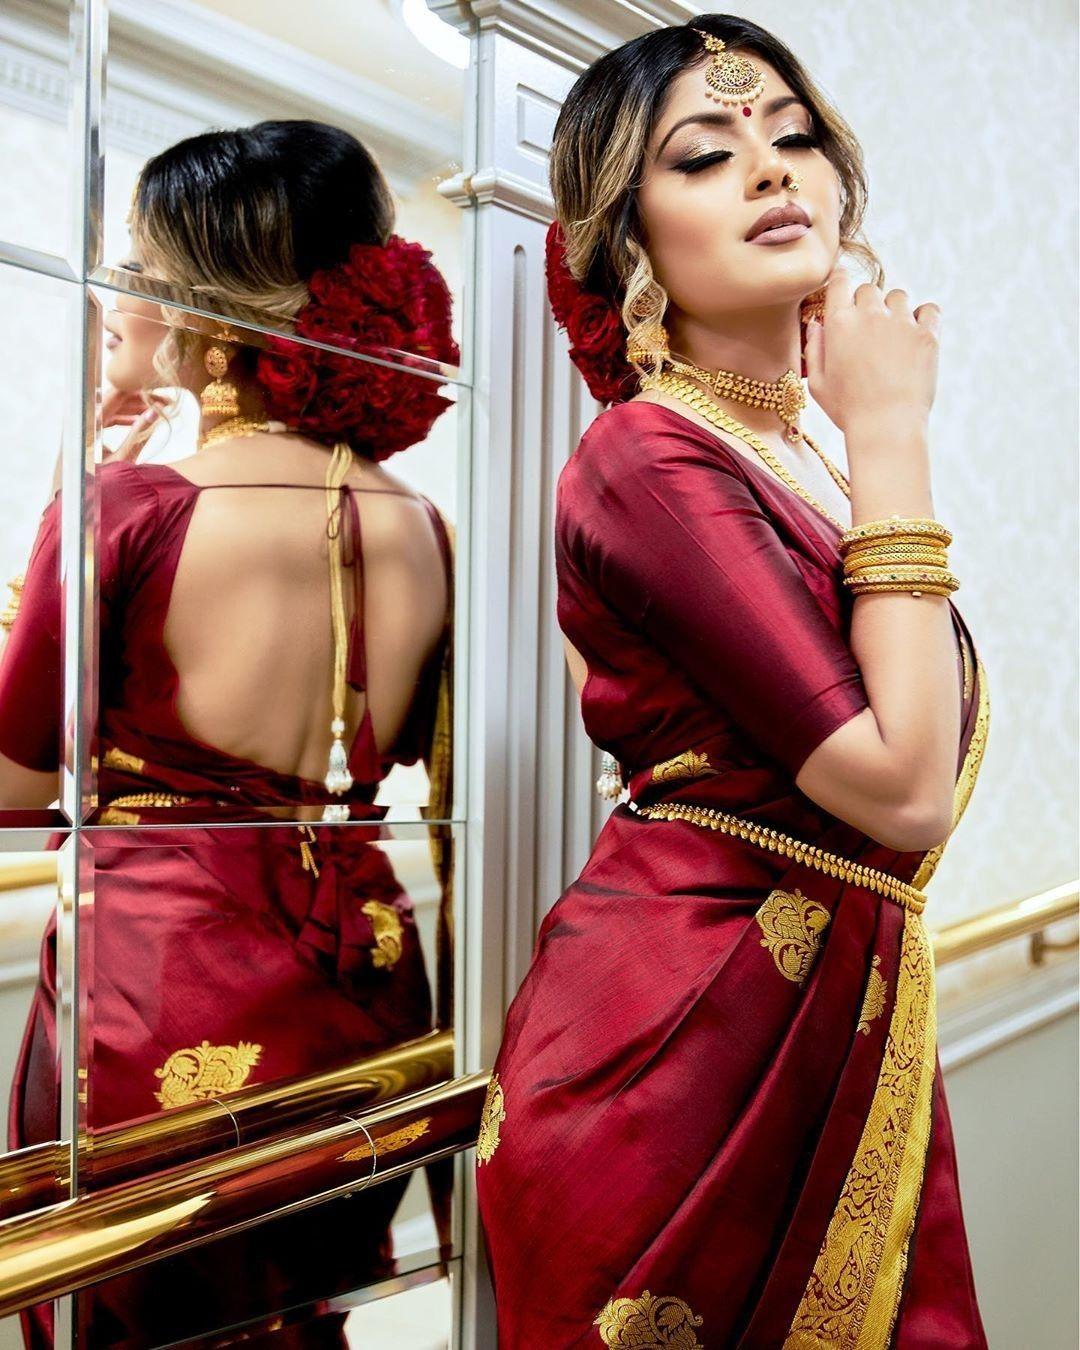 Dark Maroon Kanchipuram Silk Saree At Kanjivaramsilks Com In 2020 Kerala Wedding Saree Saree Wedding Maroon Saree